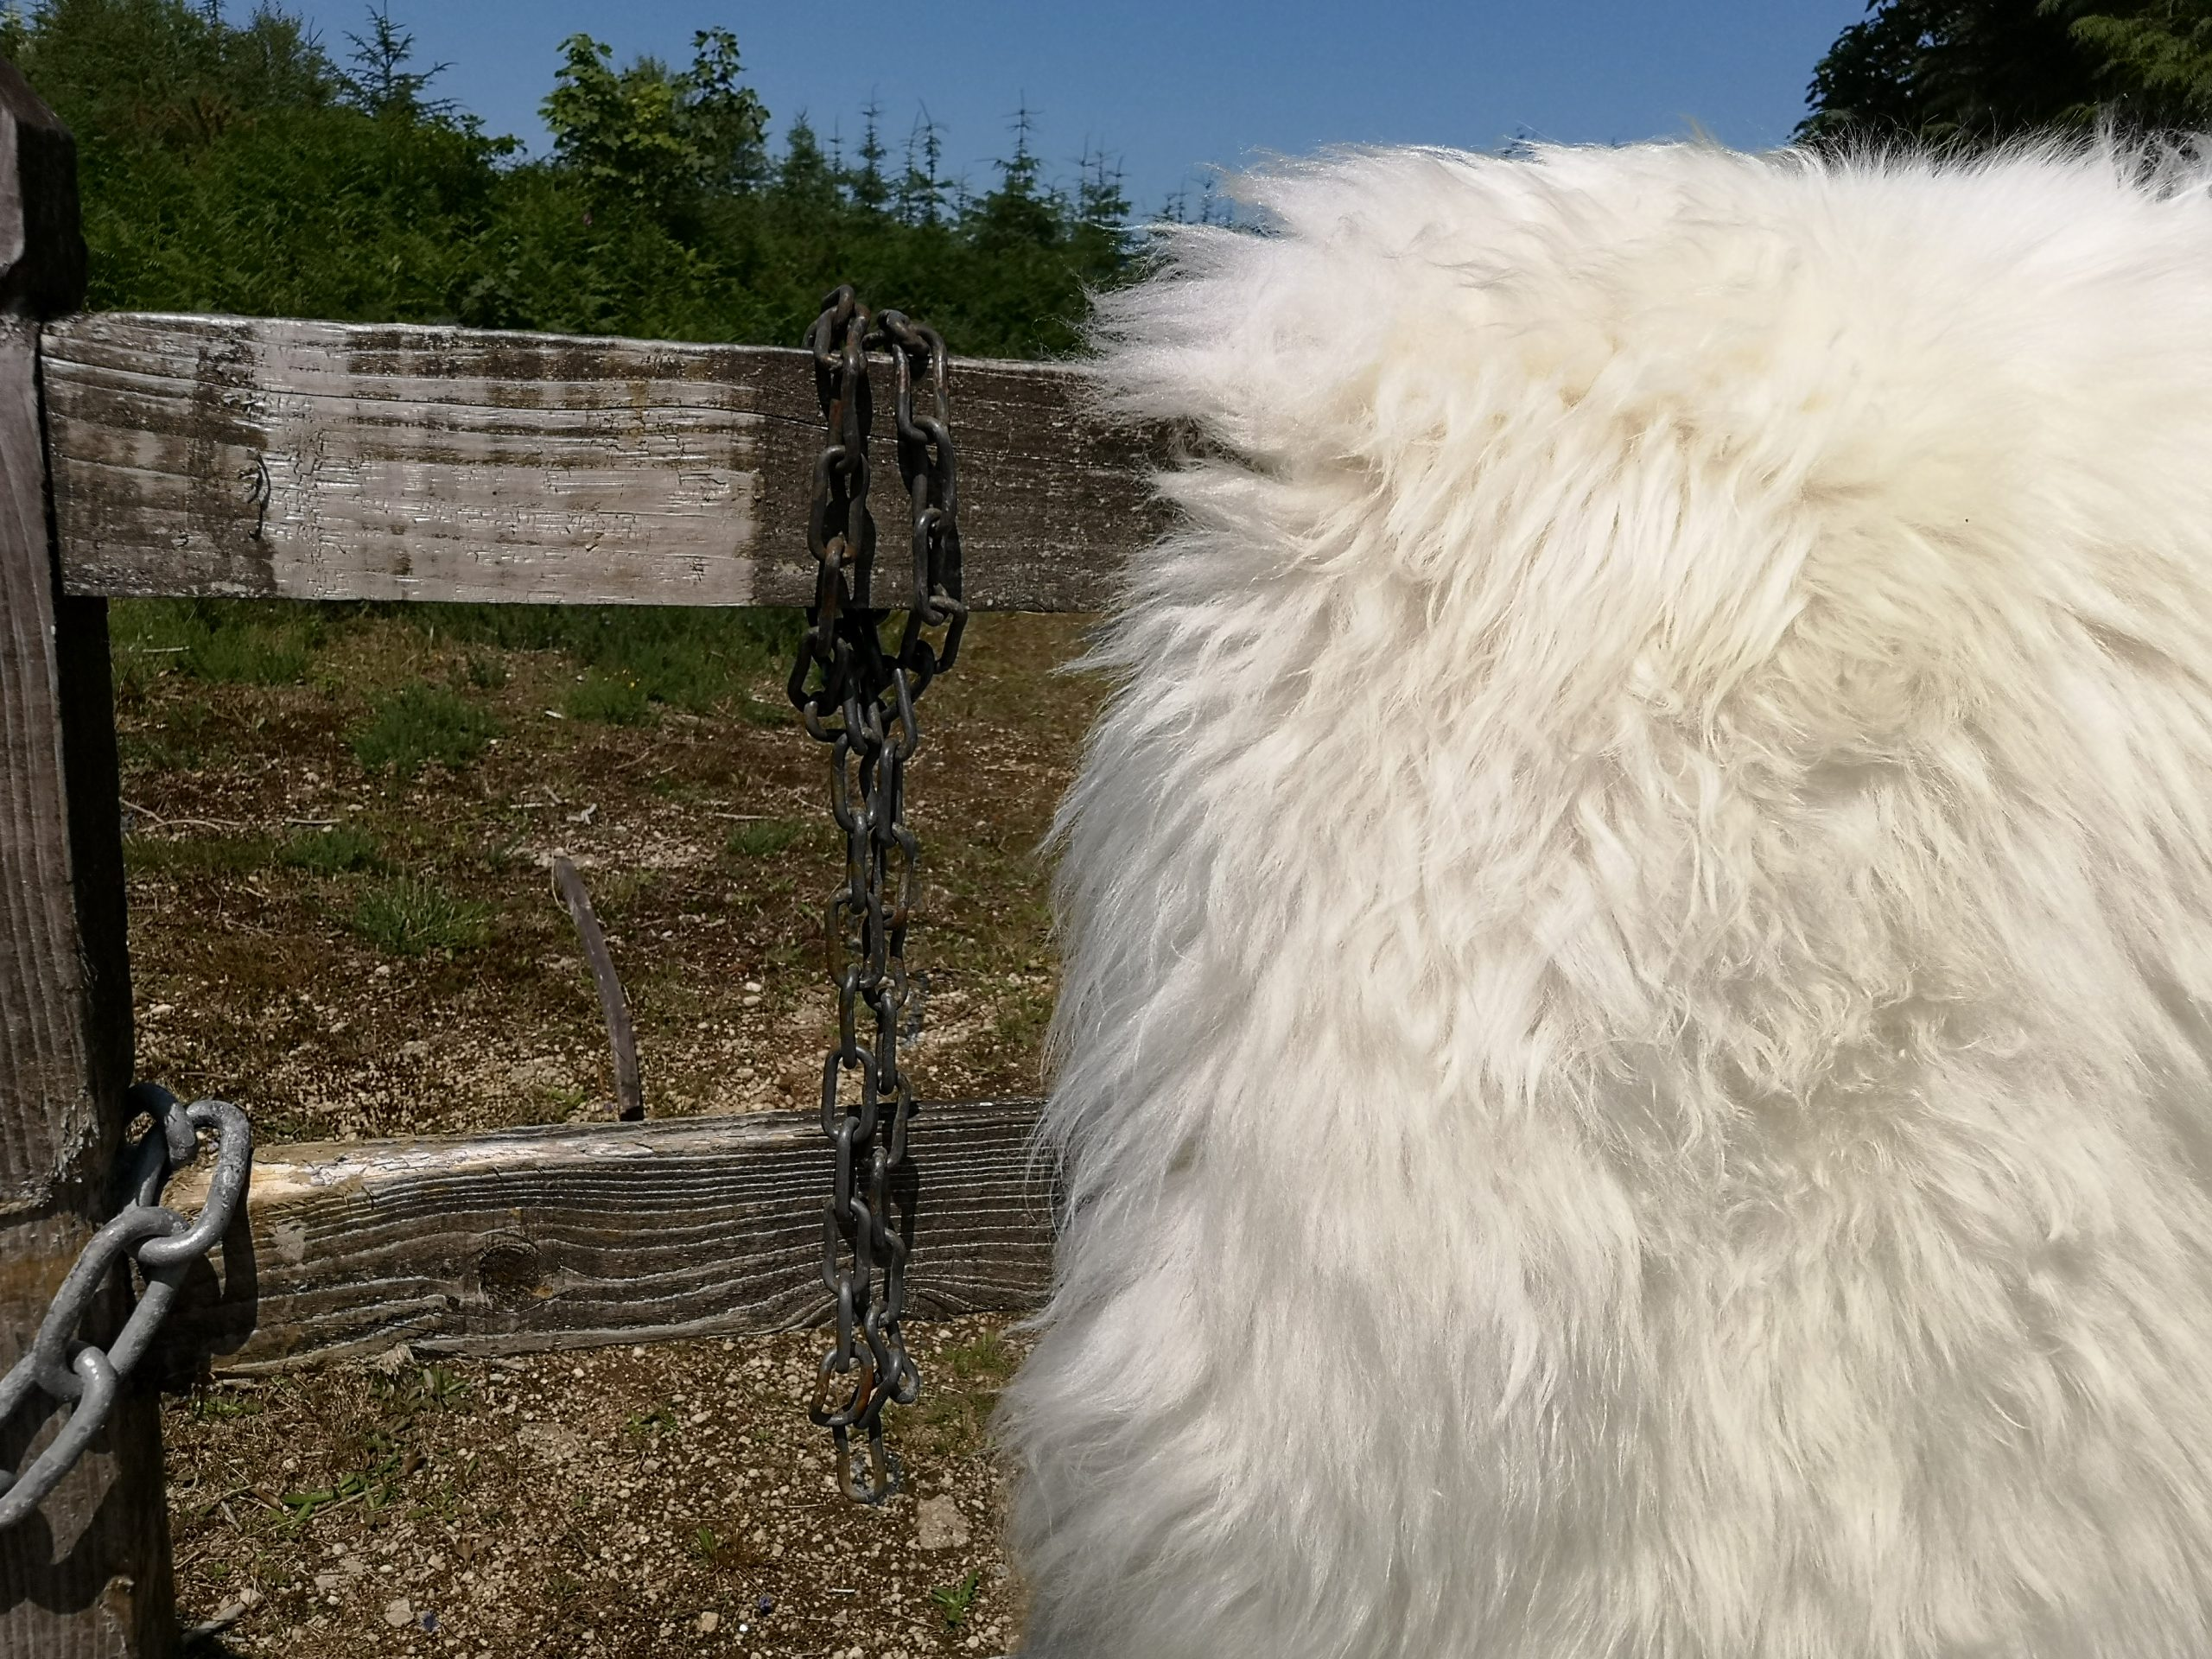 shetland sheepskin hung on a gate